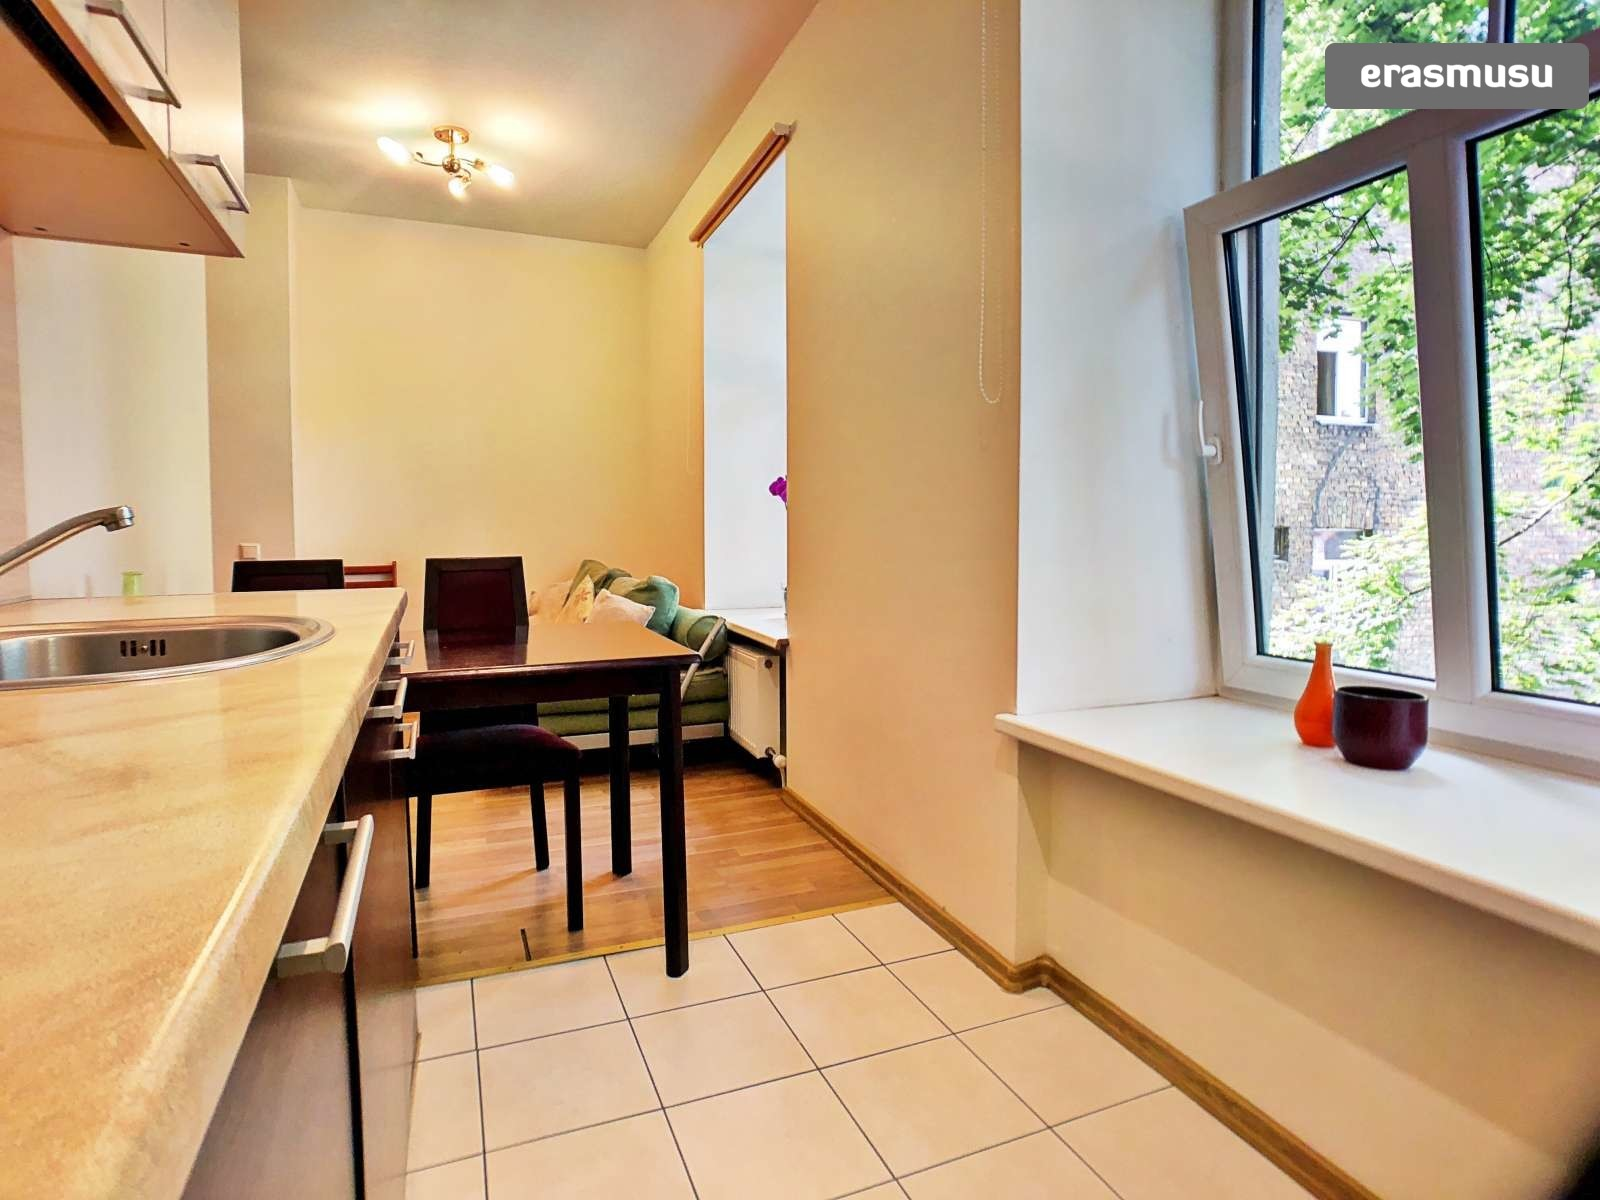 bright-1-bedroom-apartment-rent-maskavas-forstate-8027678e14fd7d